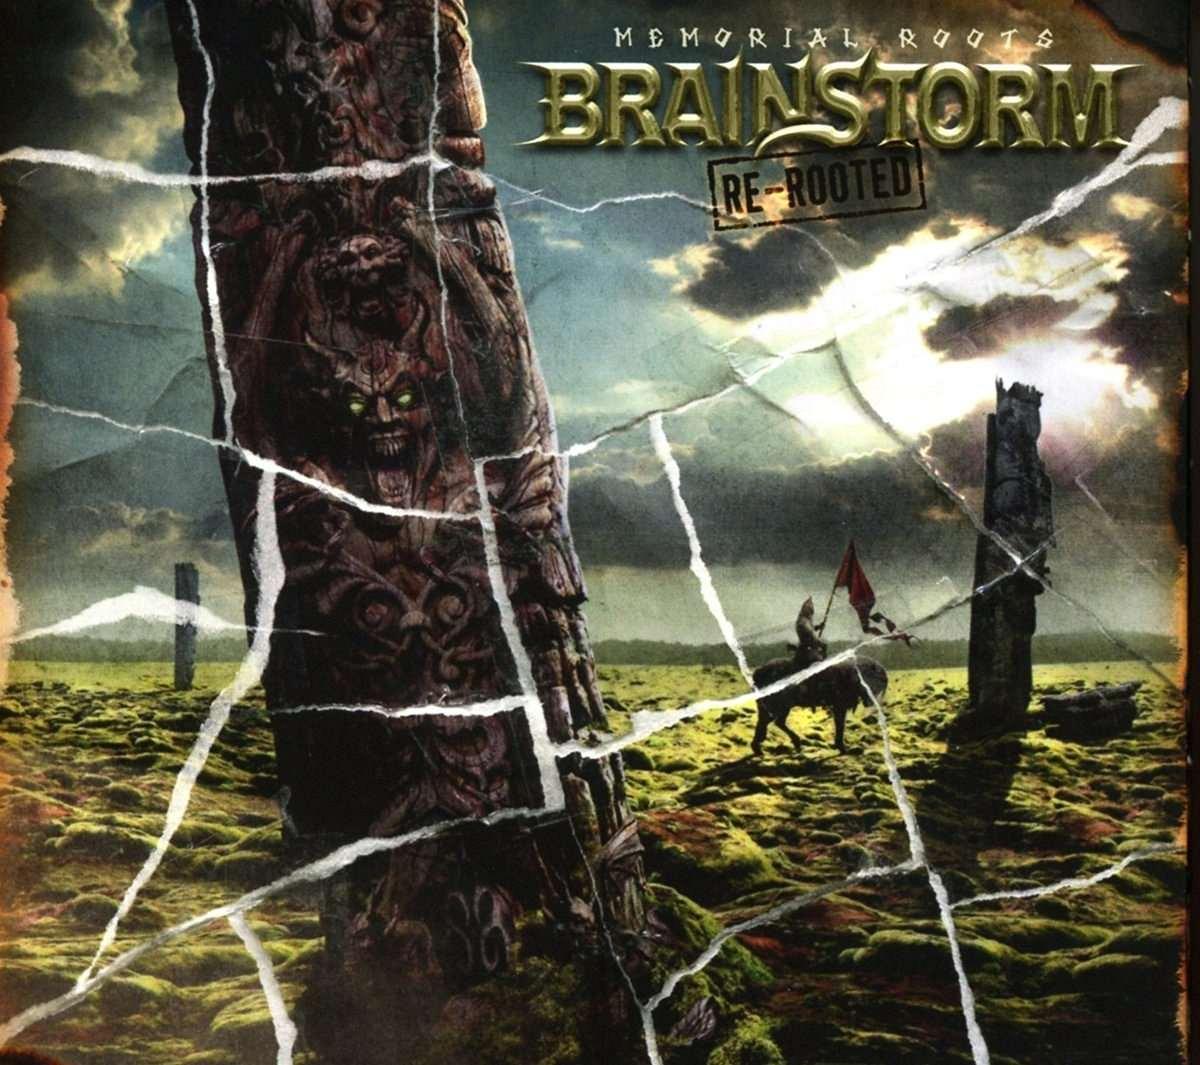 Brainstorm: Memorial Roots (2016) Book Cover